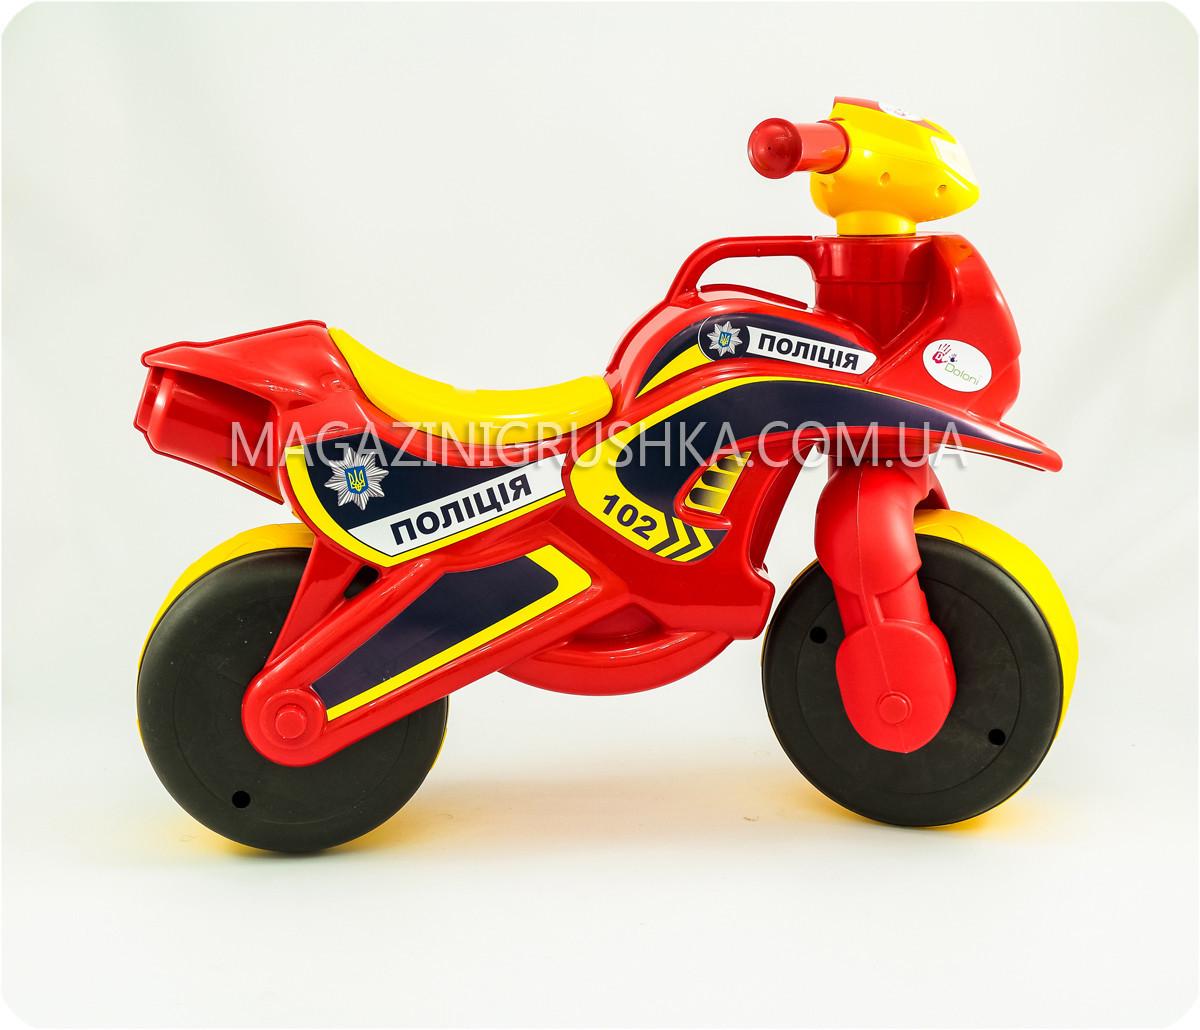 Мотоцикл Байкер Спорт 0139/10B немузыкальный